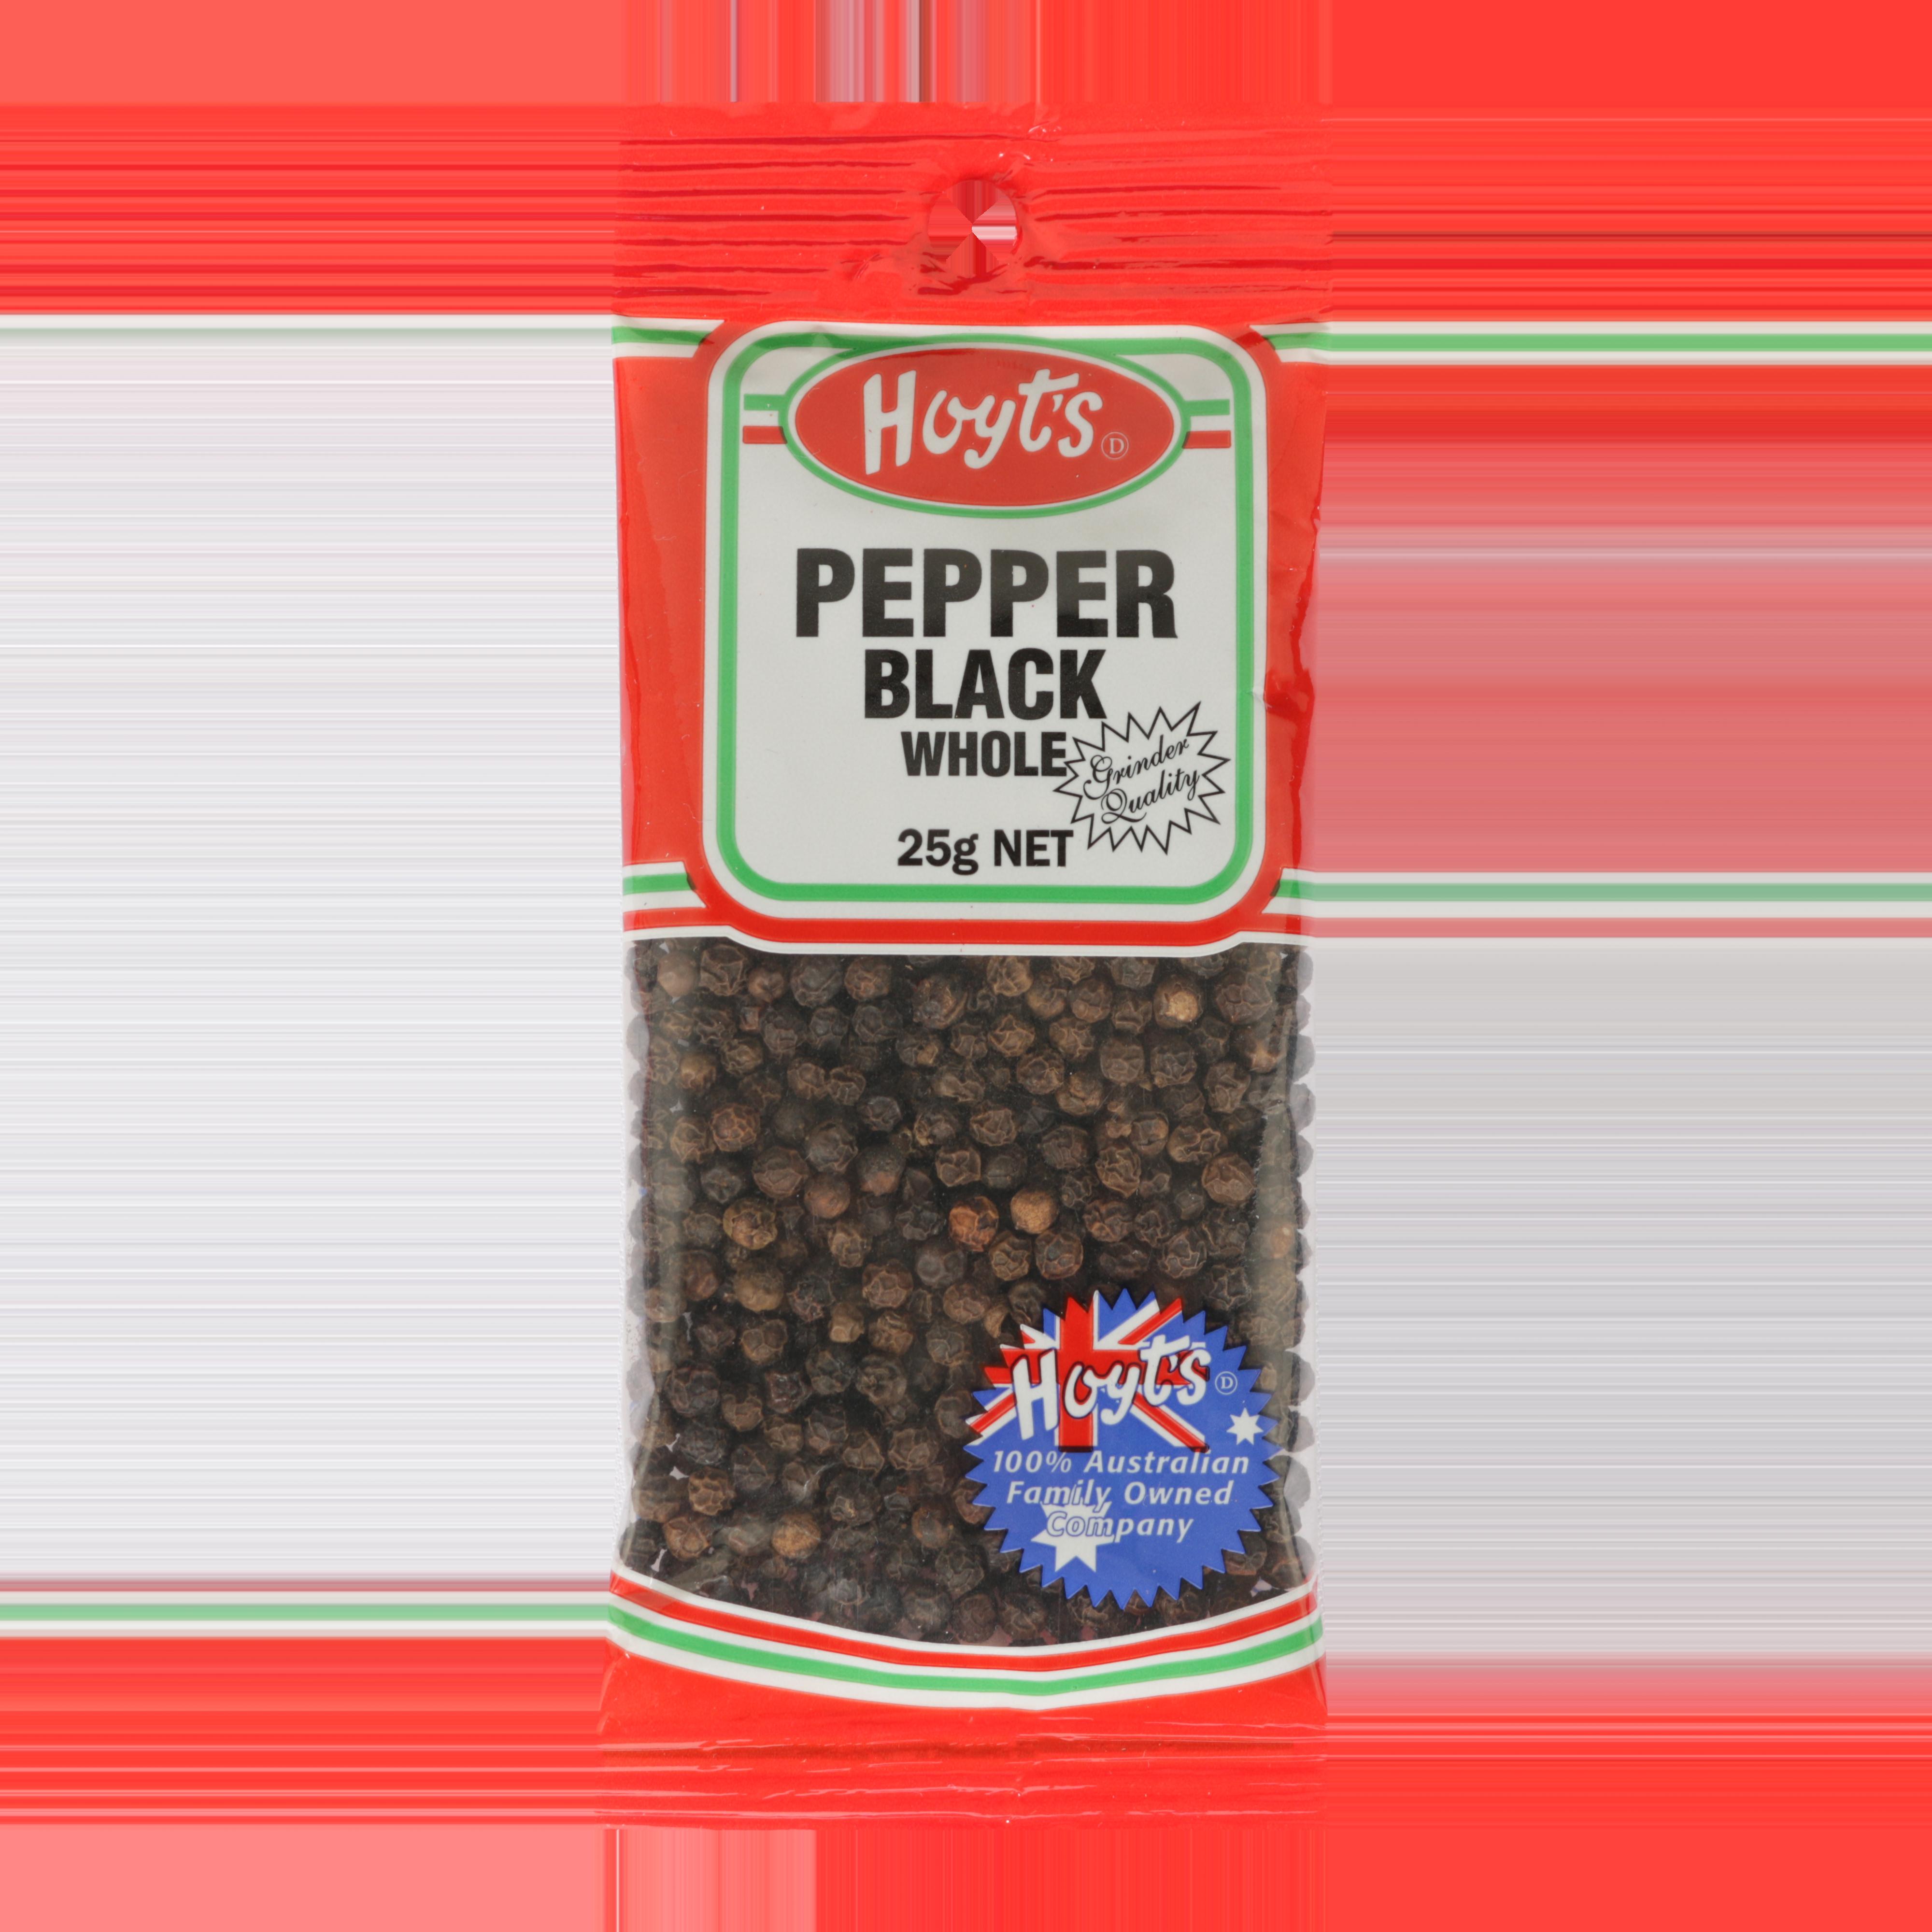 Hoyts Black Pepper Whole 25g